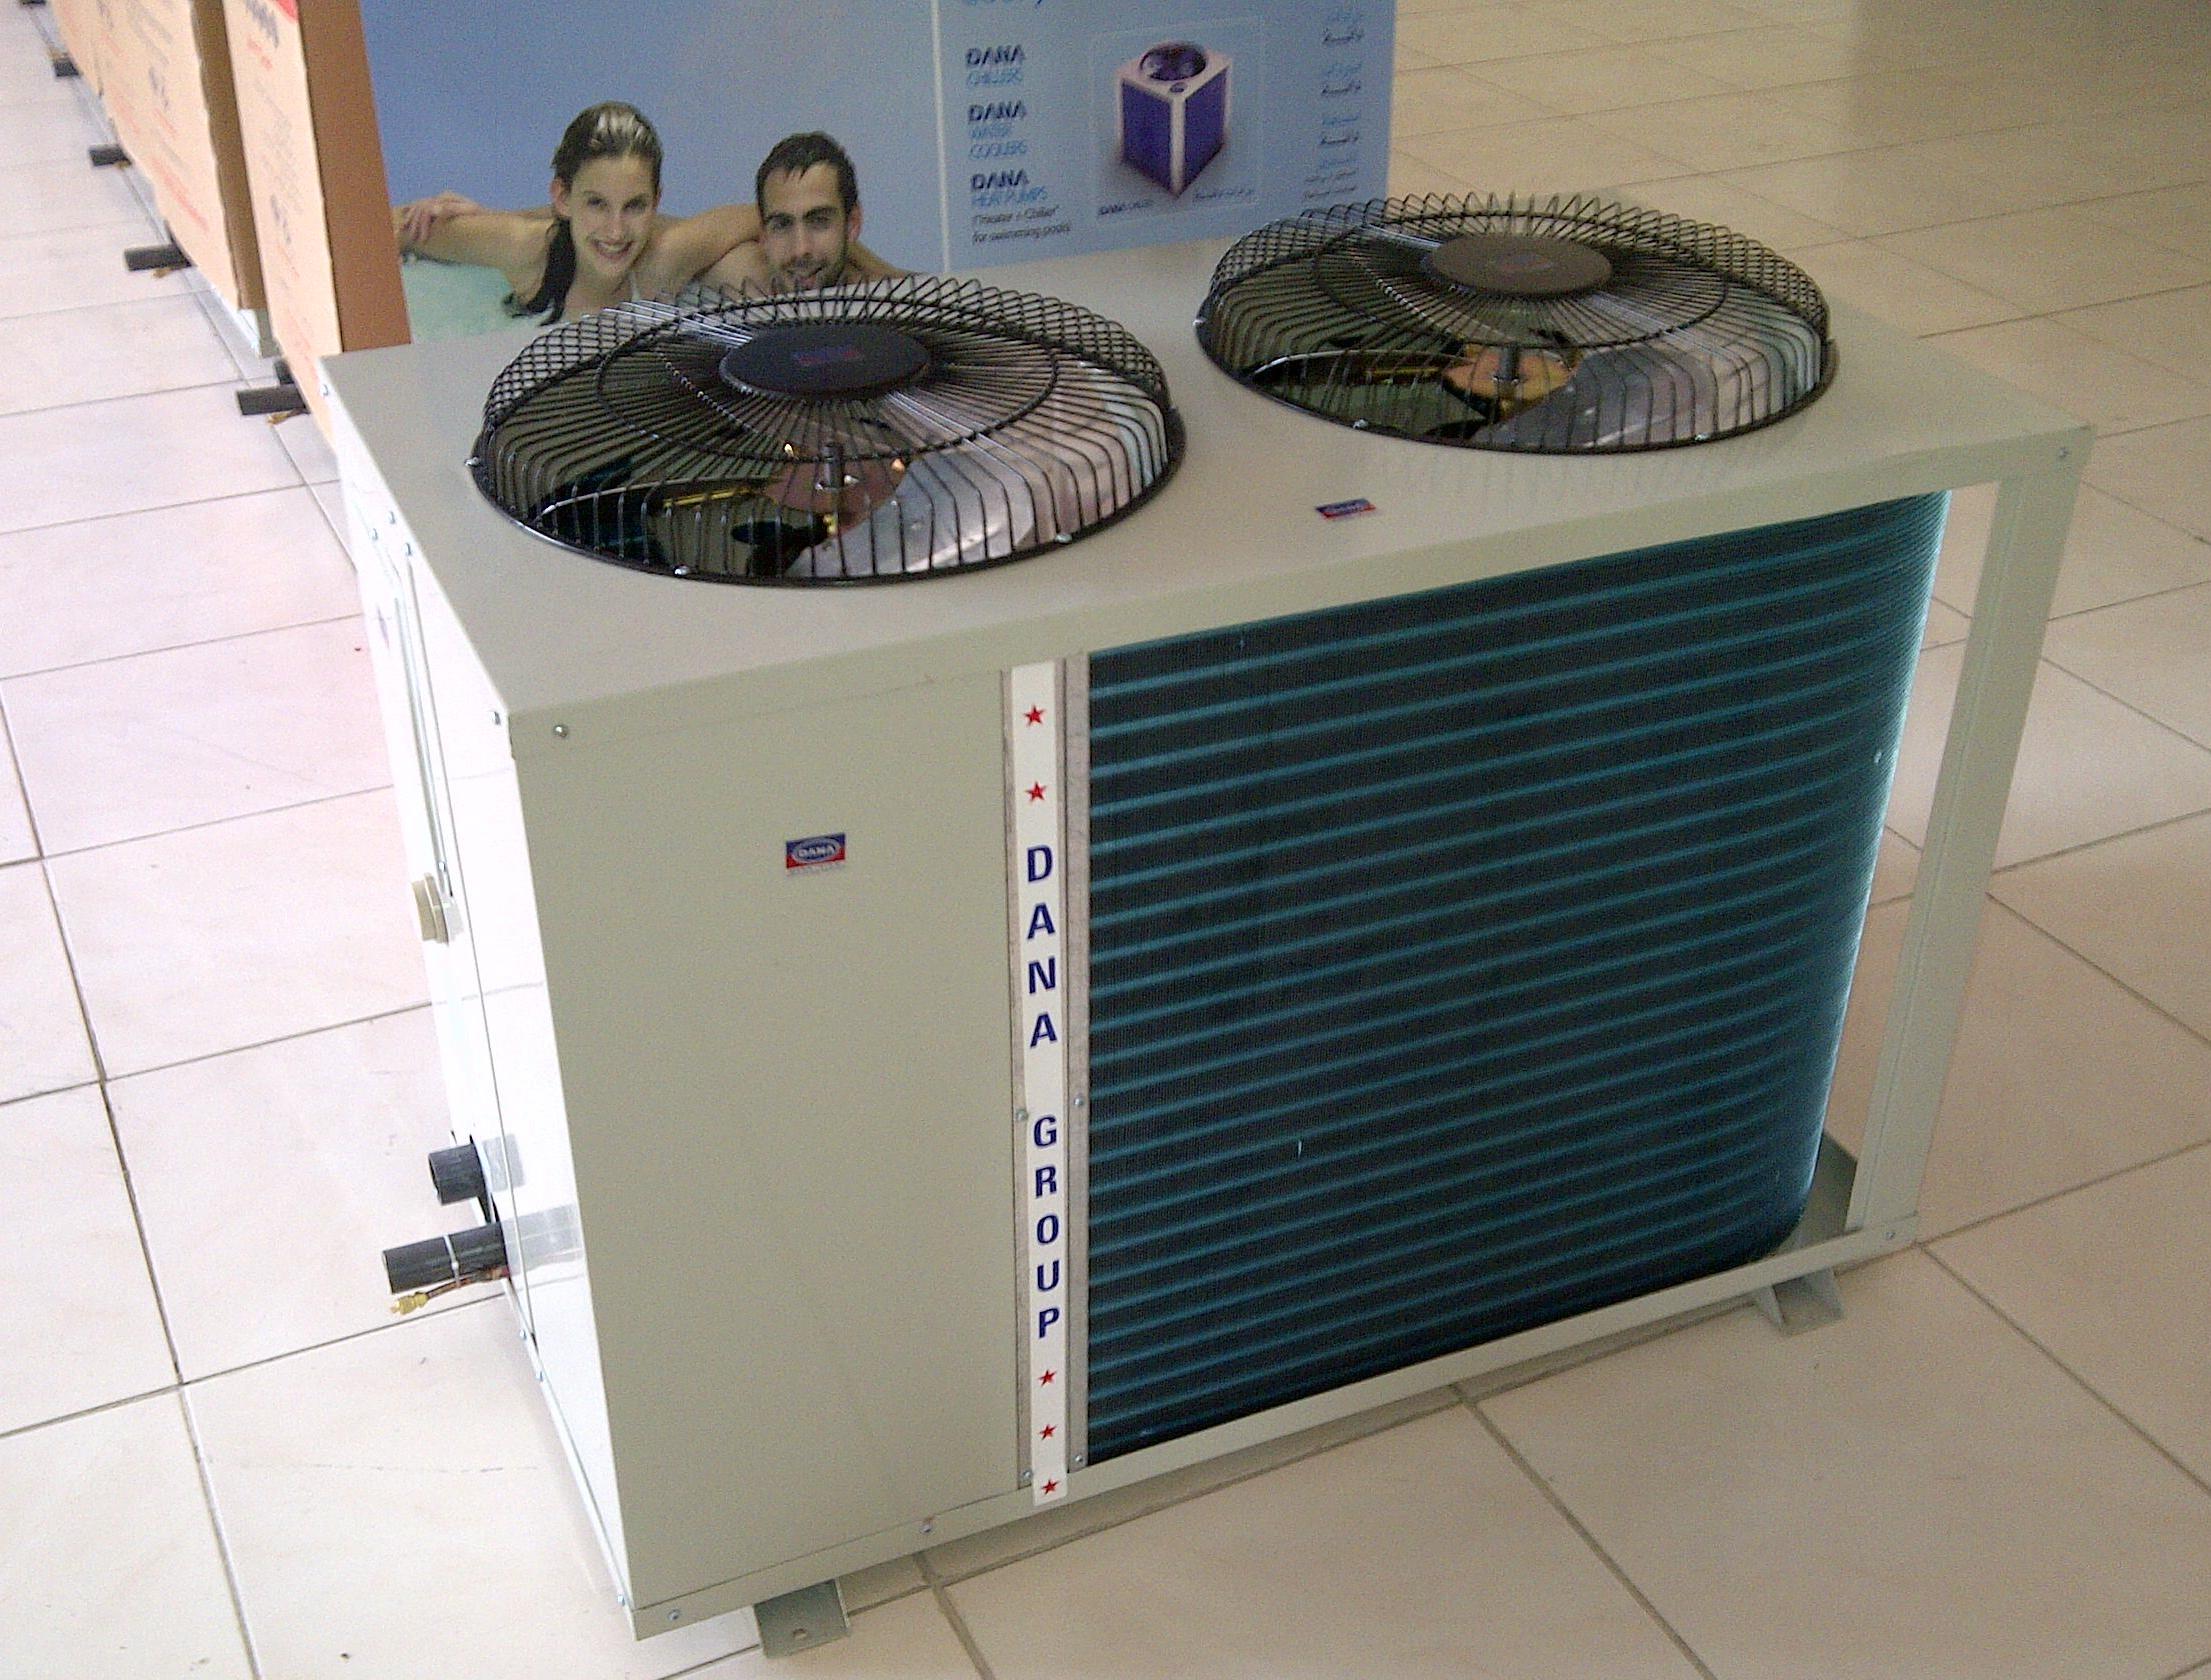 chilled water system supplier Nigeria